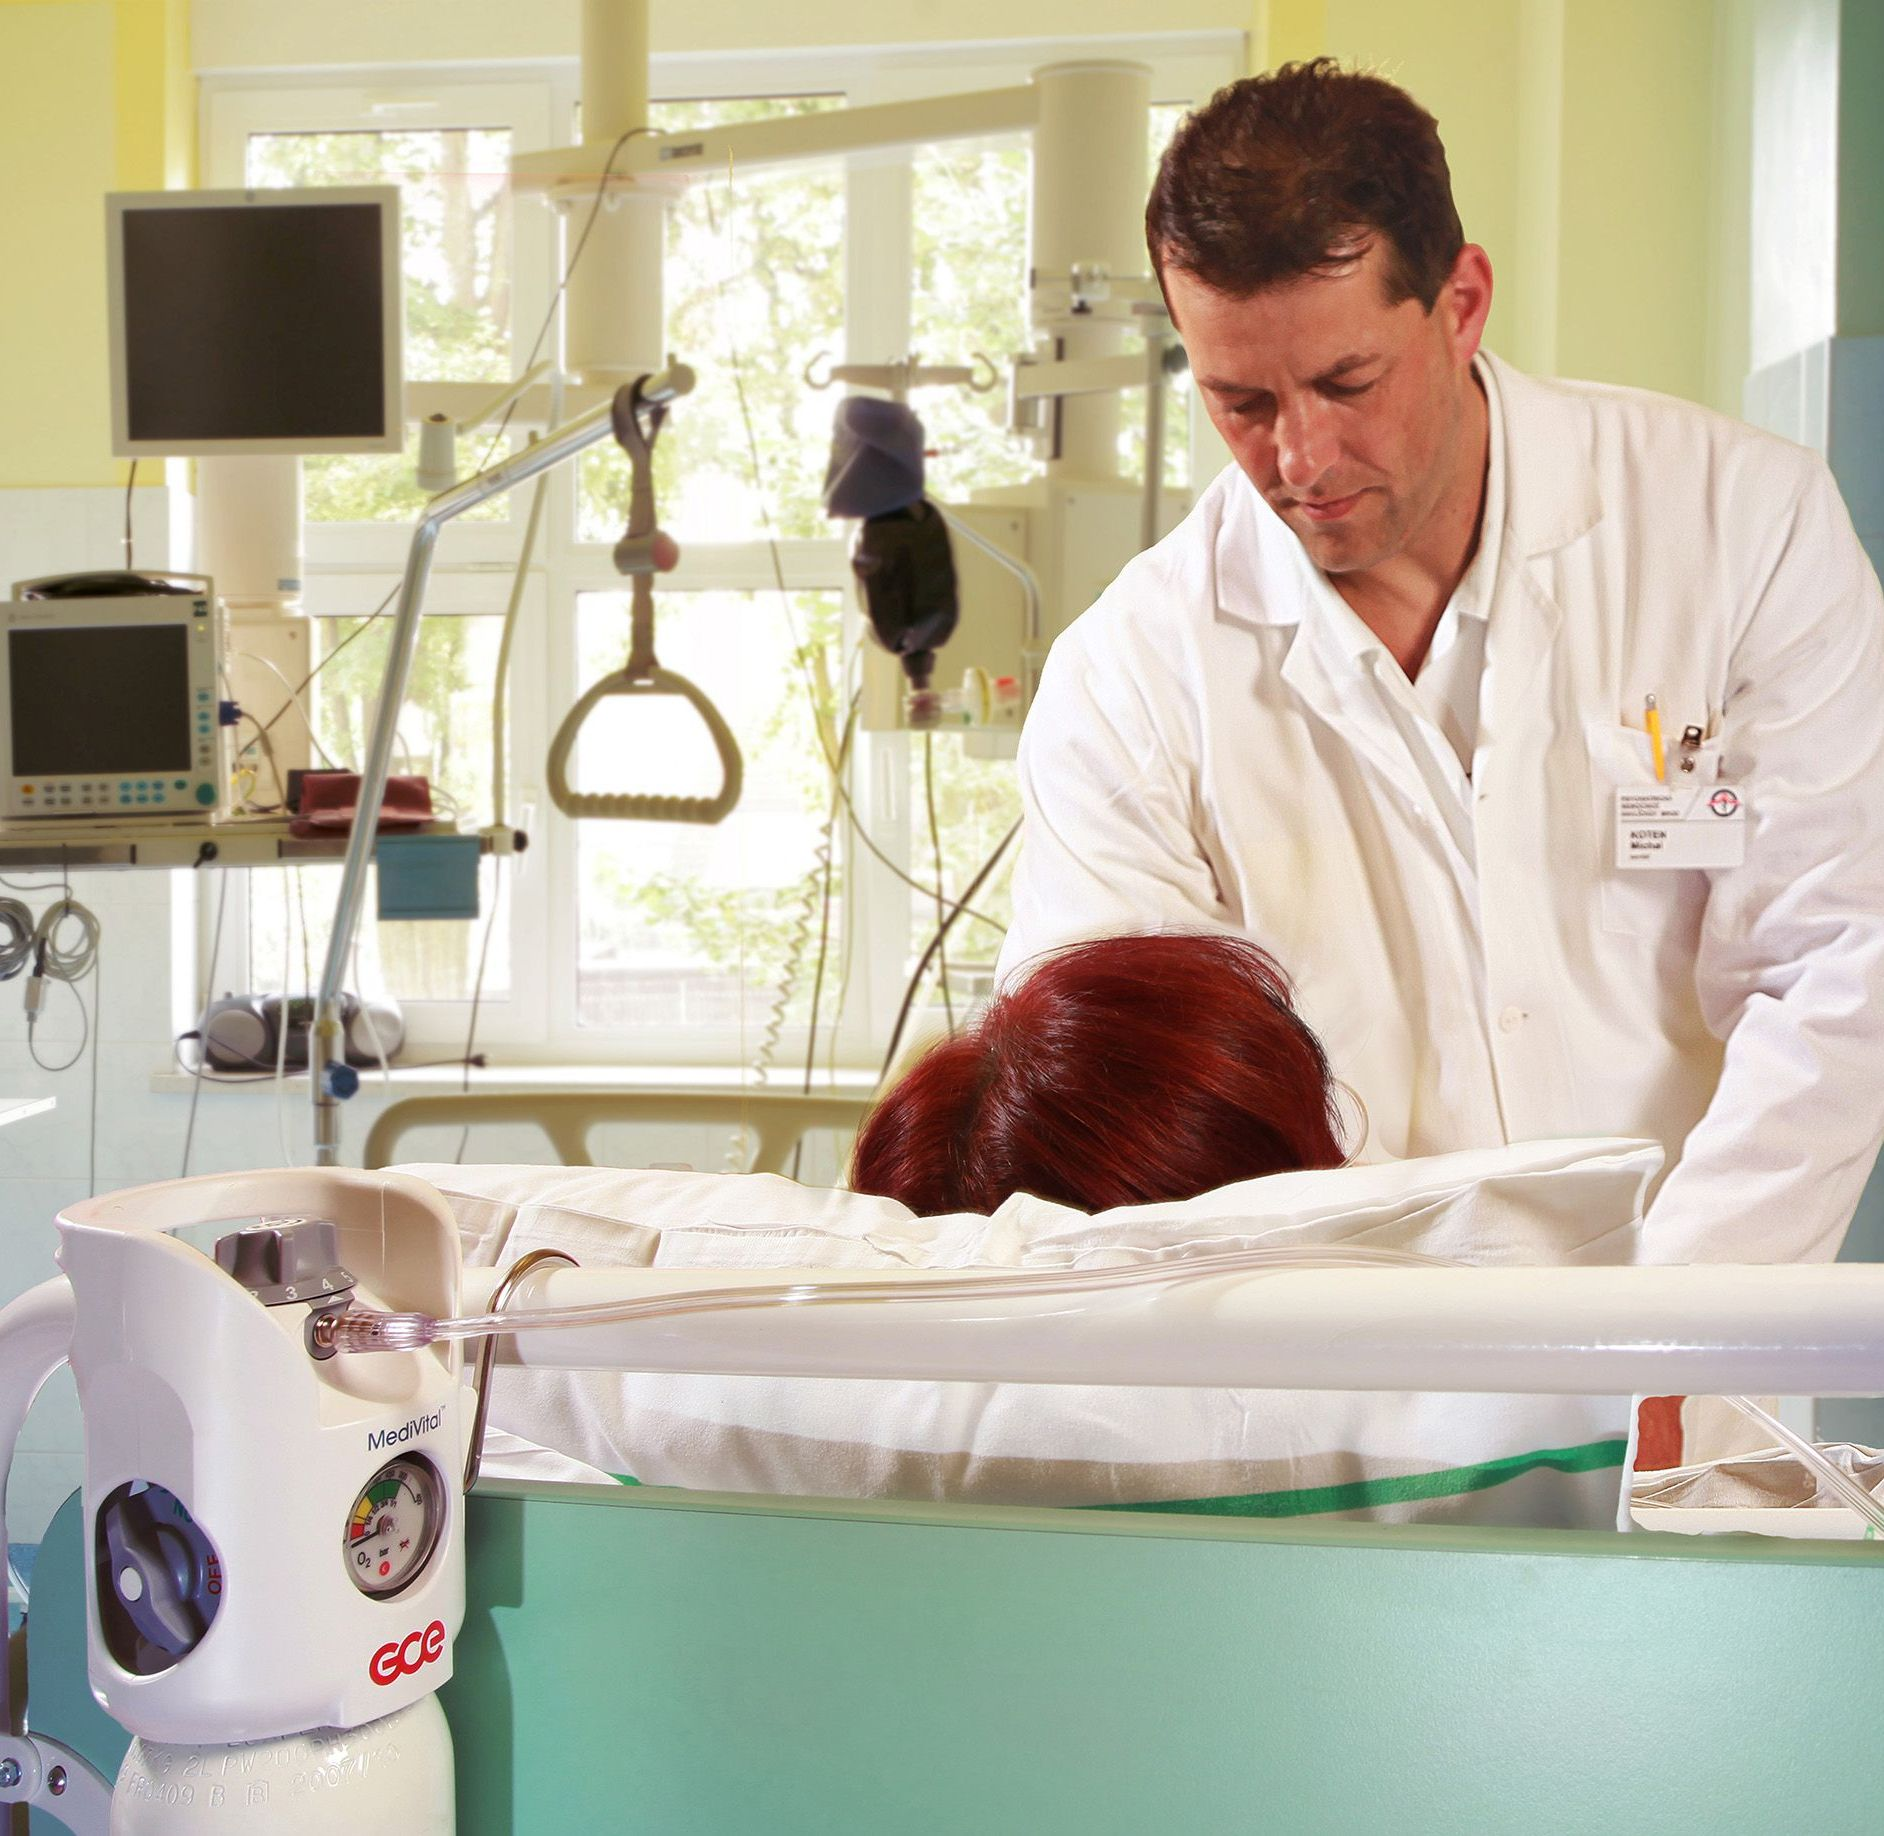 Hospital Wards page image